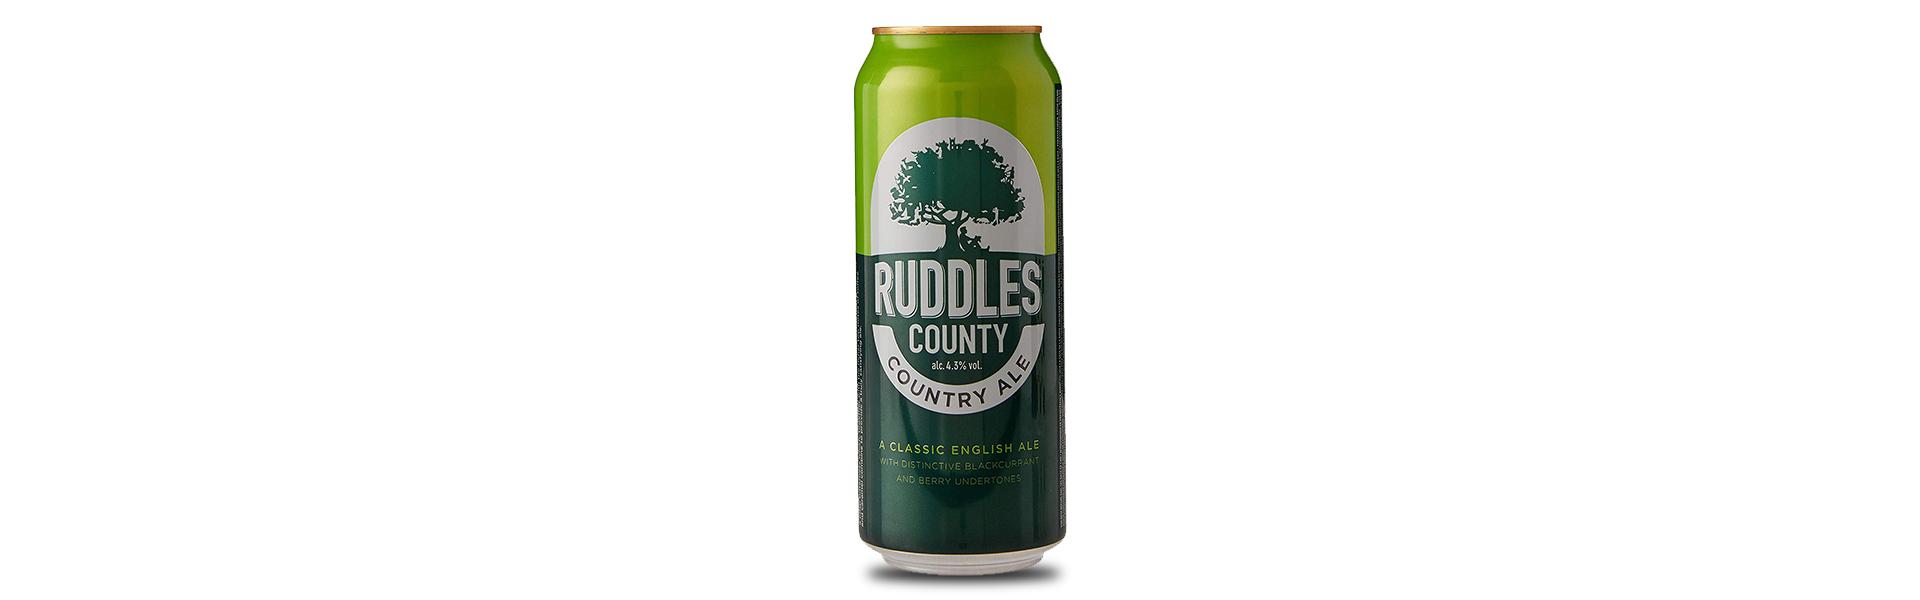 Ruddles County – engelsk ölnyhet med Systembolaget ovanligaste humlesort?